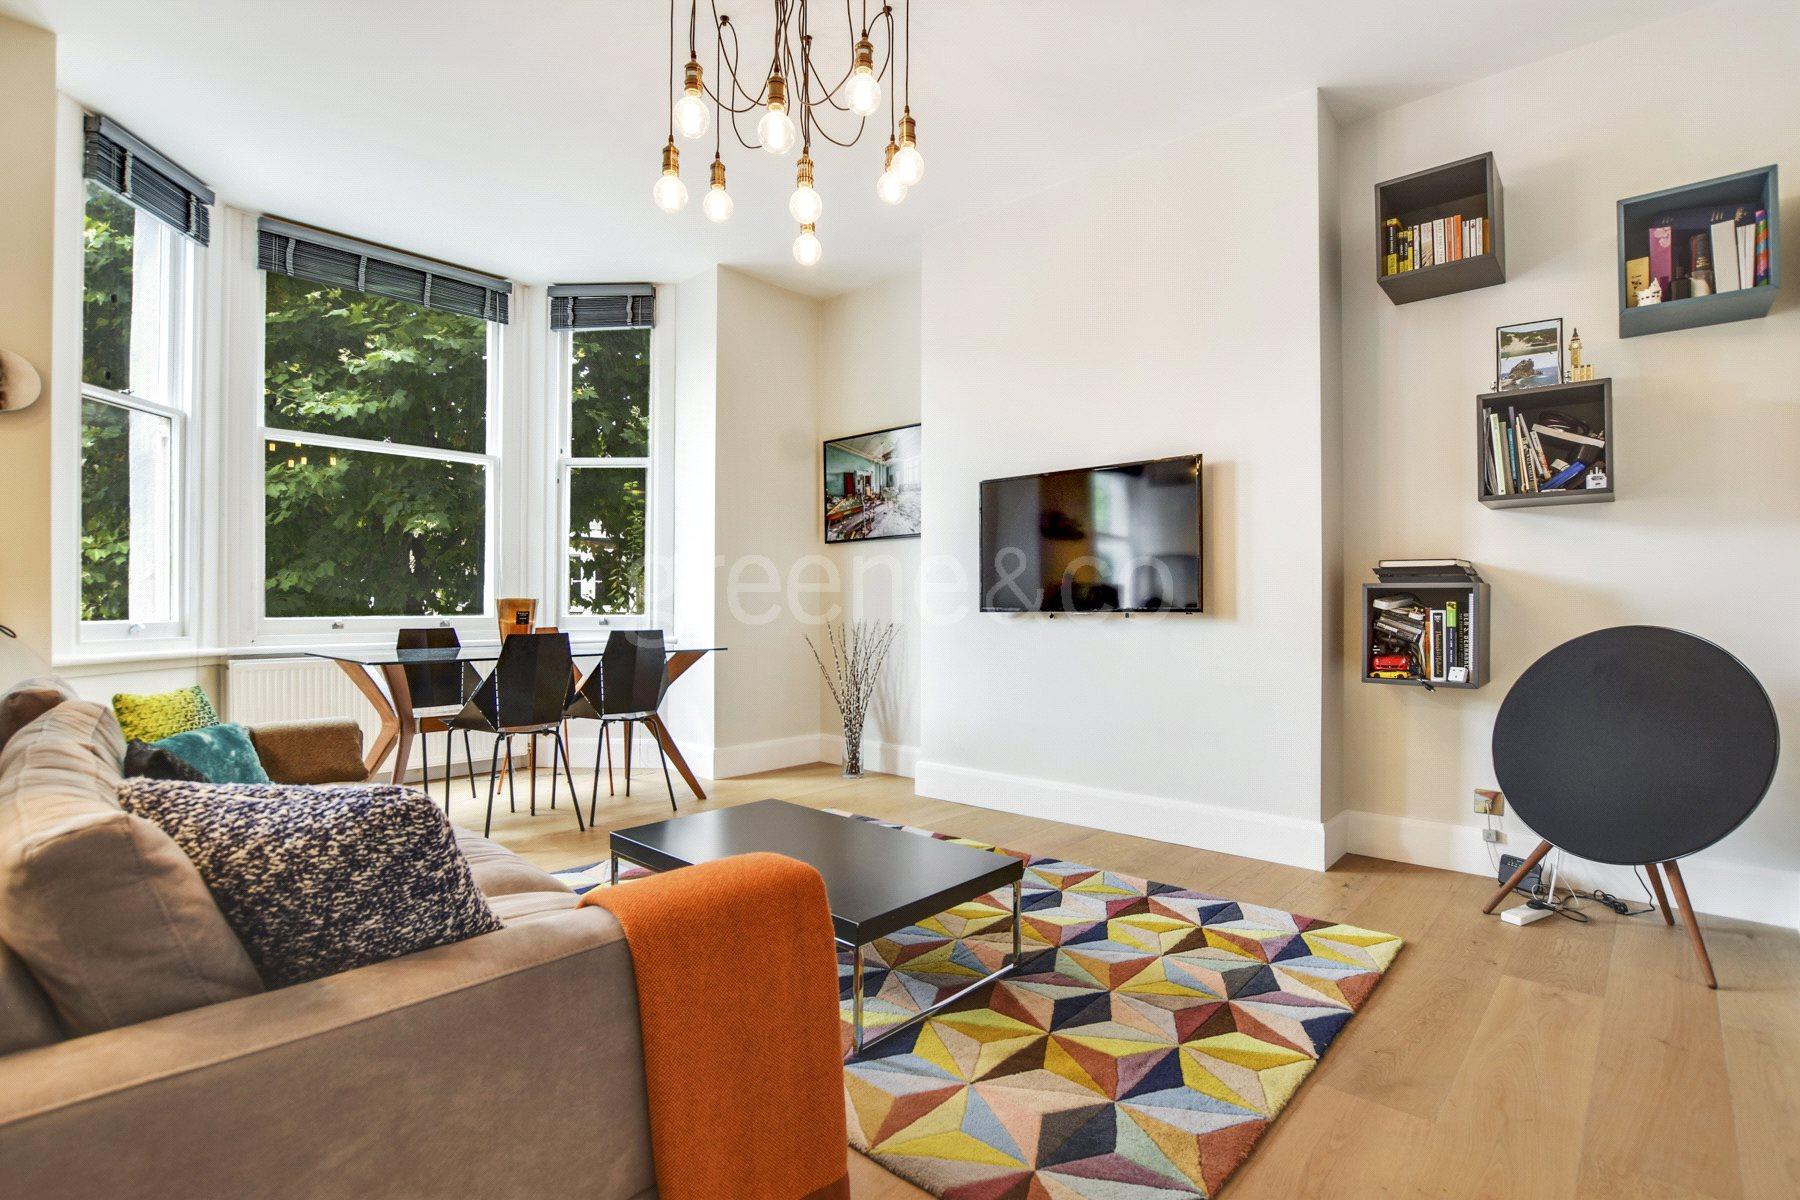 2 Bedrooms Flat for sale in Brondesbury Villas, London, NW6